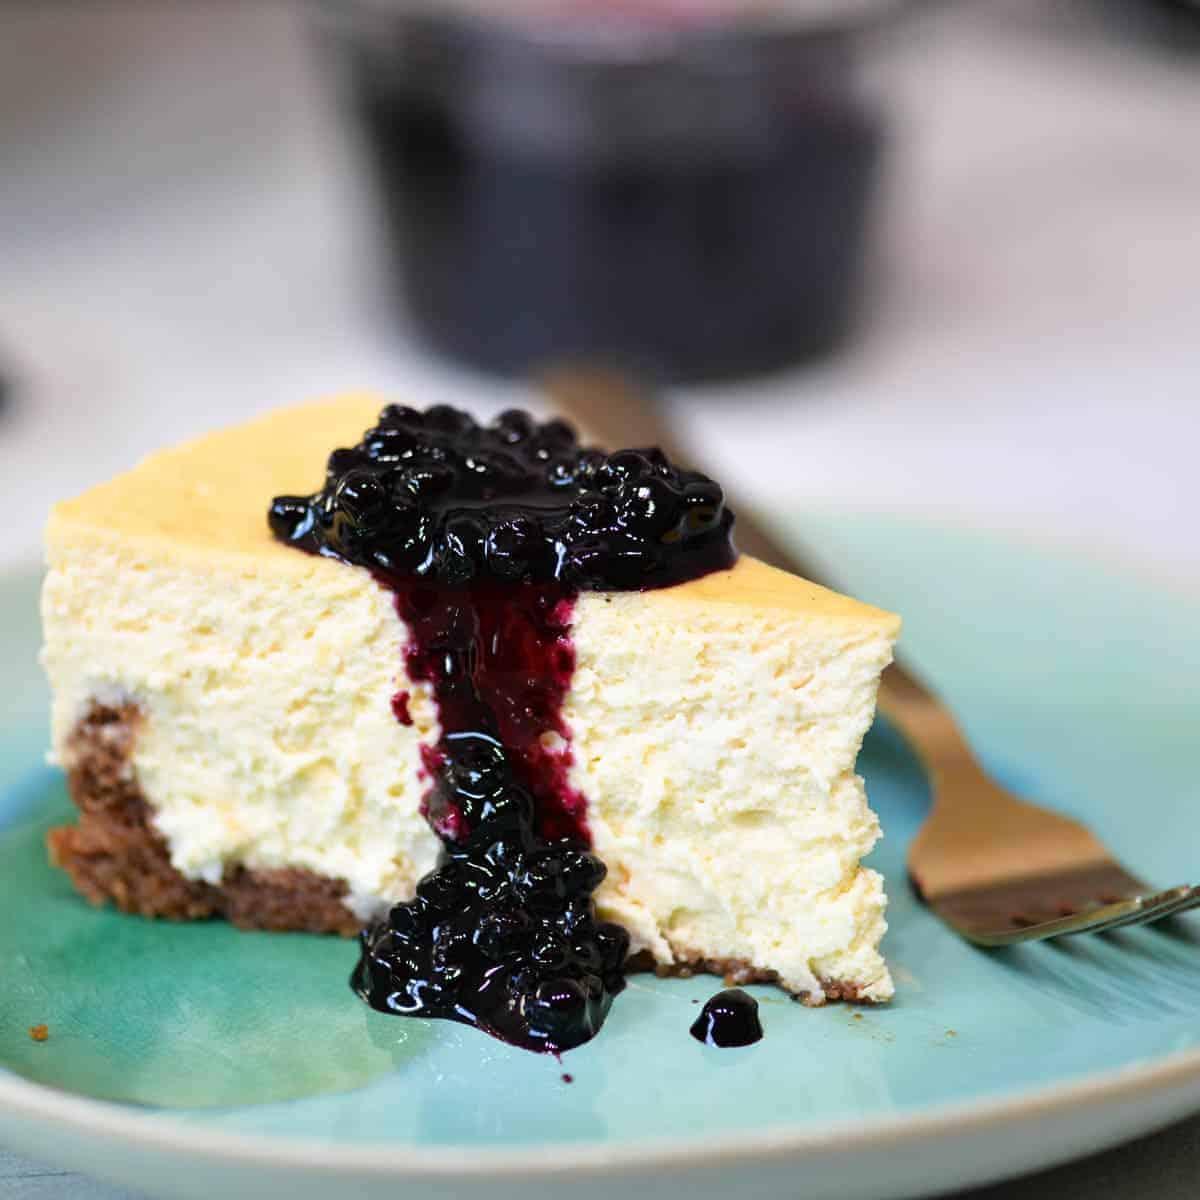 blueberry cheesecake on an aqua plate